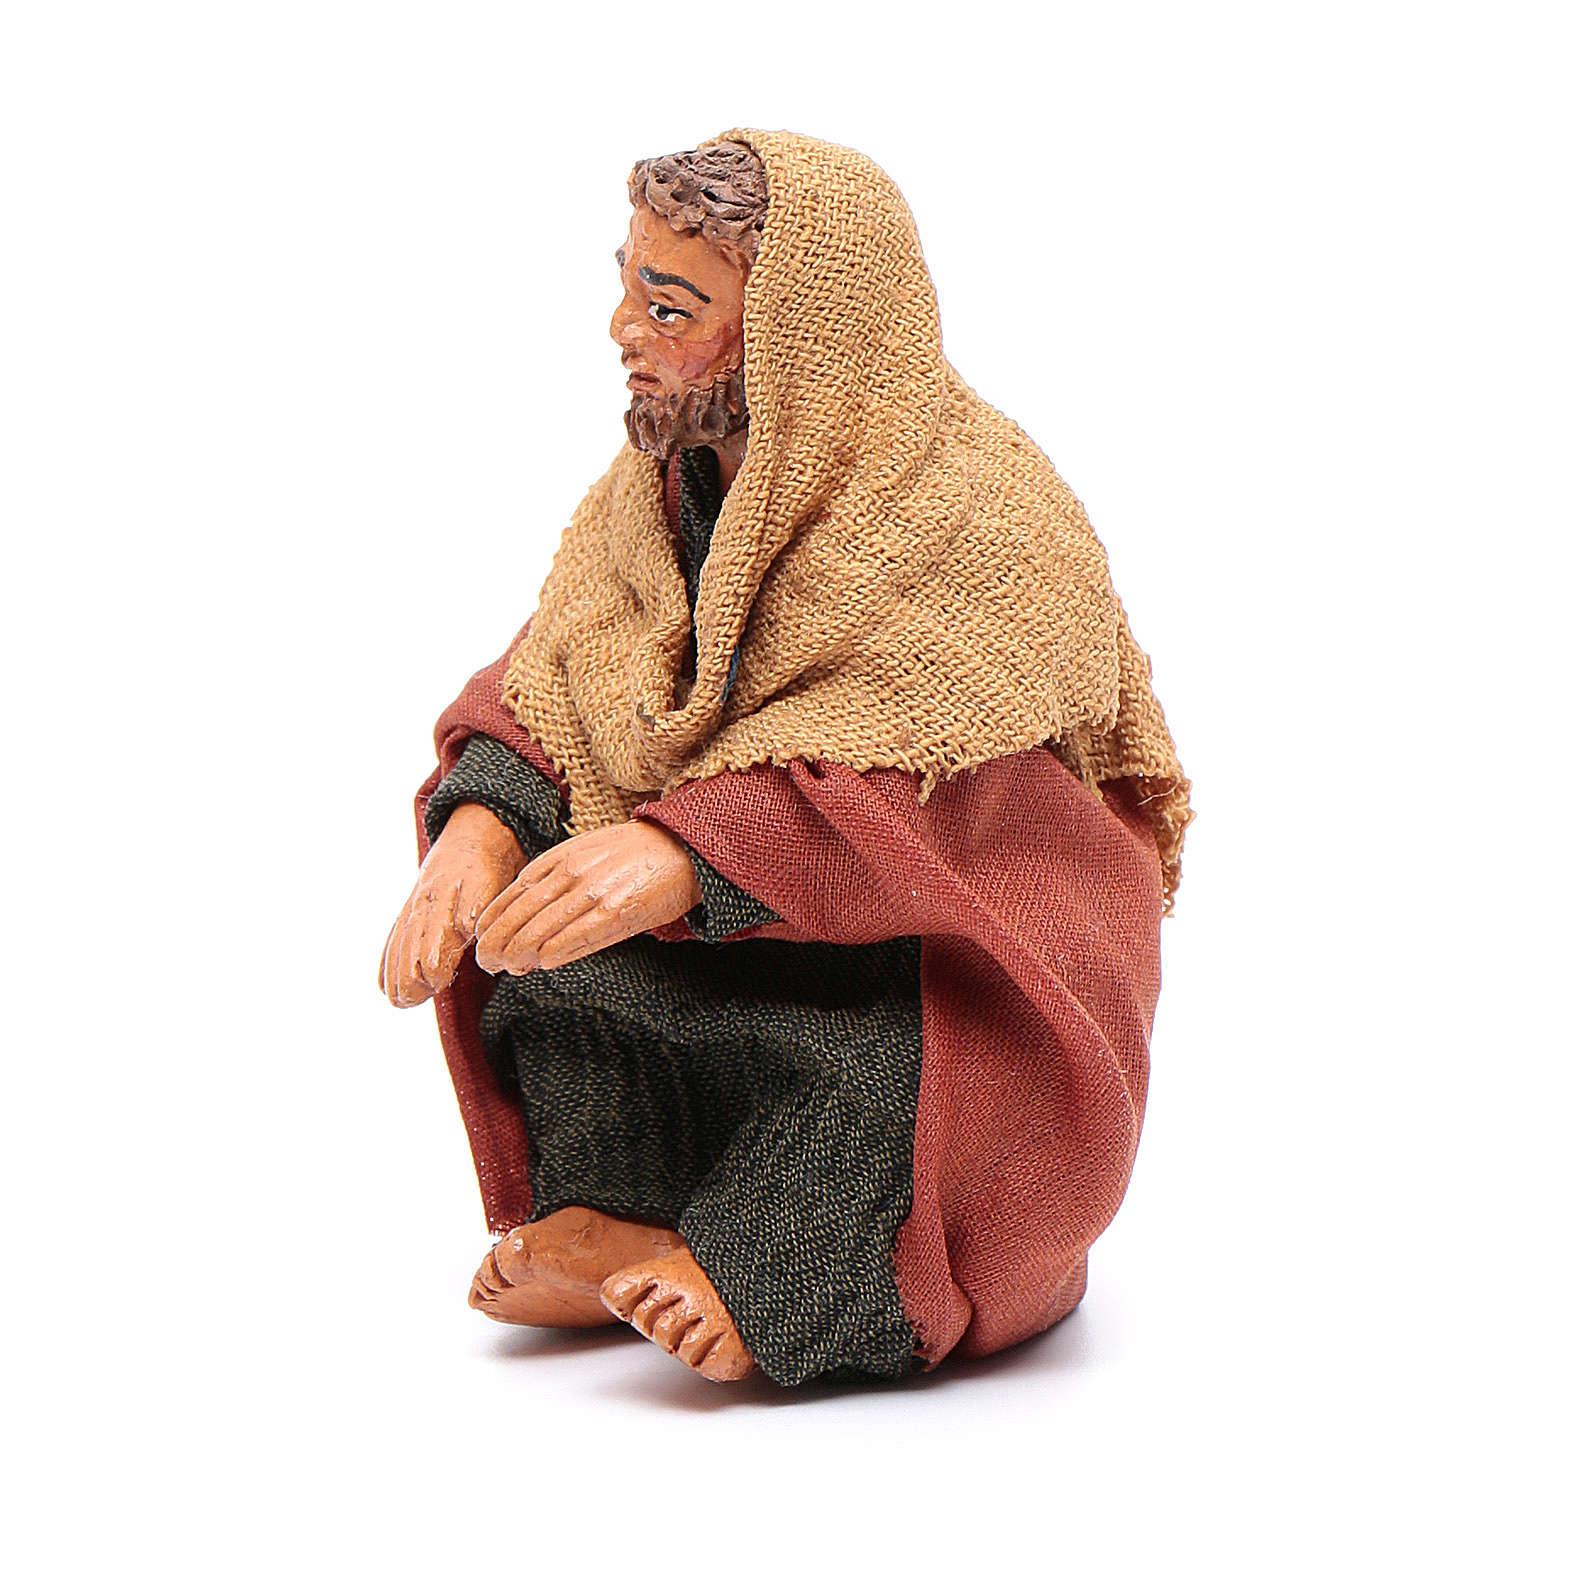 Man warming hands 10cm, Neapolitan Nativity scene 4